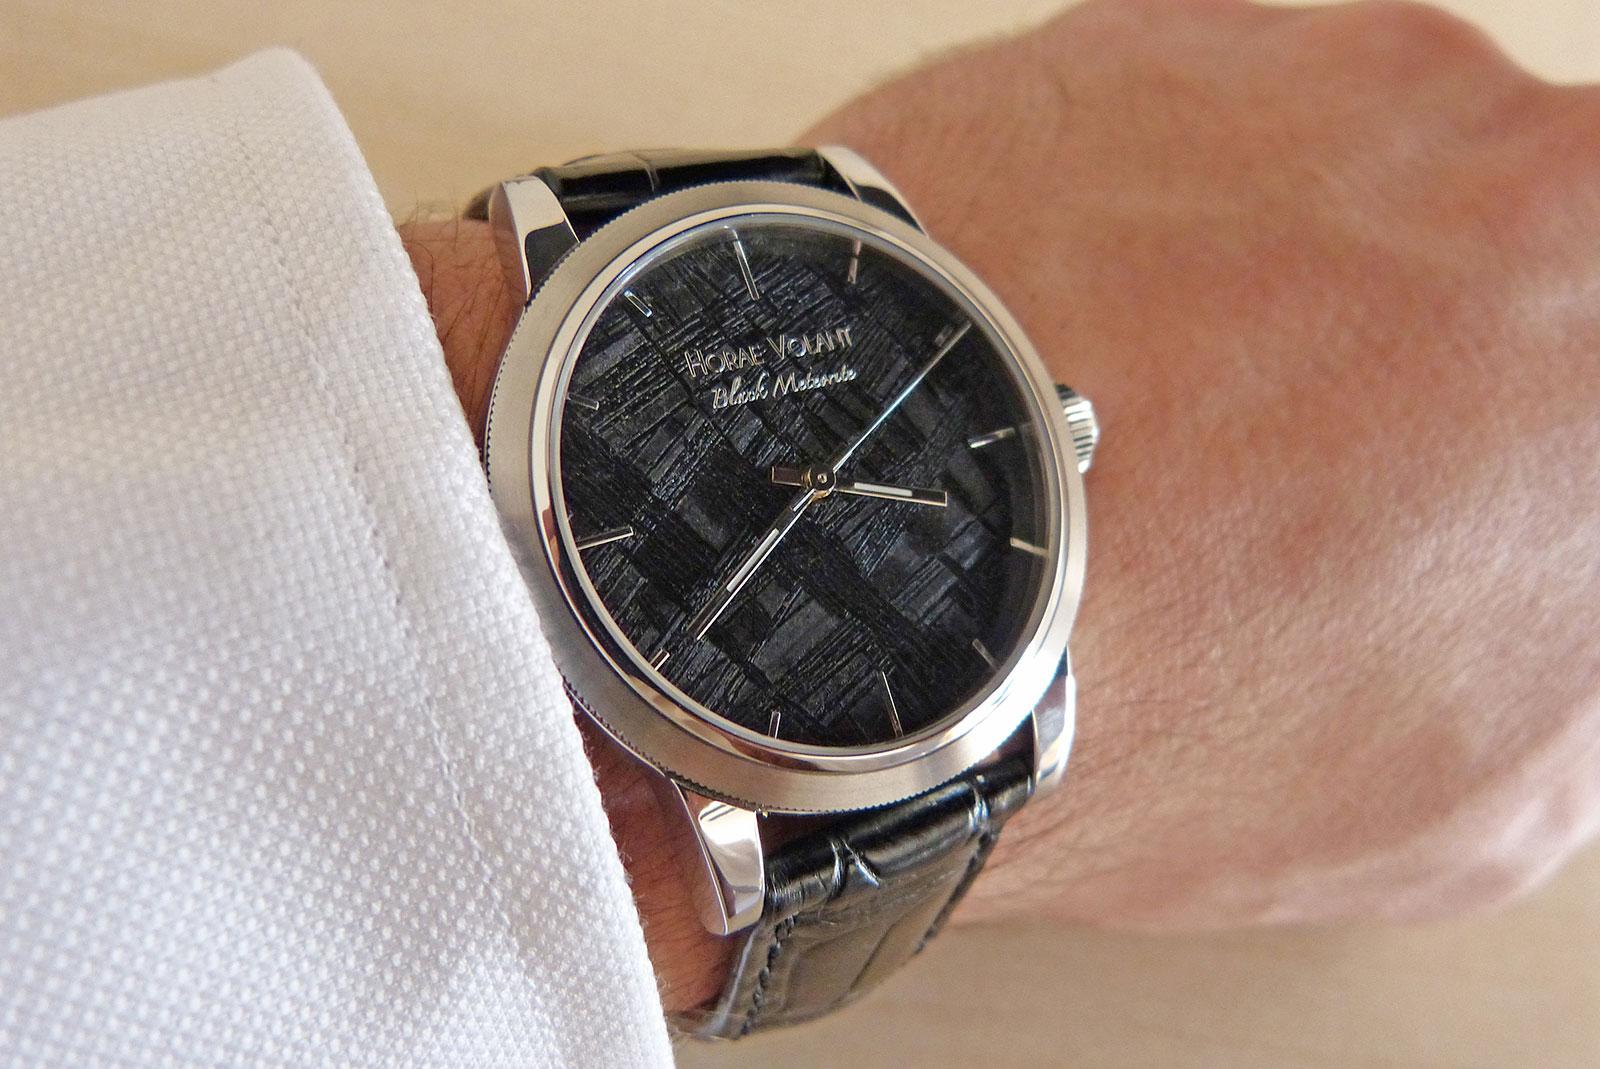 Horae Volant Black Meteorite watch 5